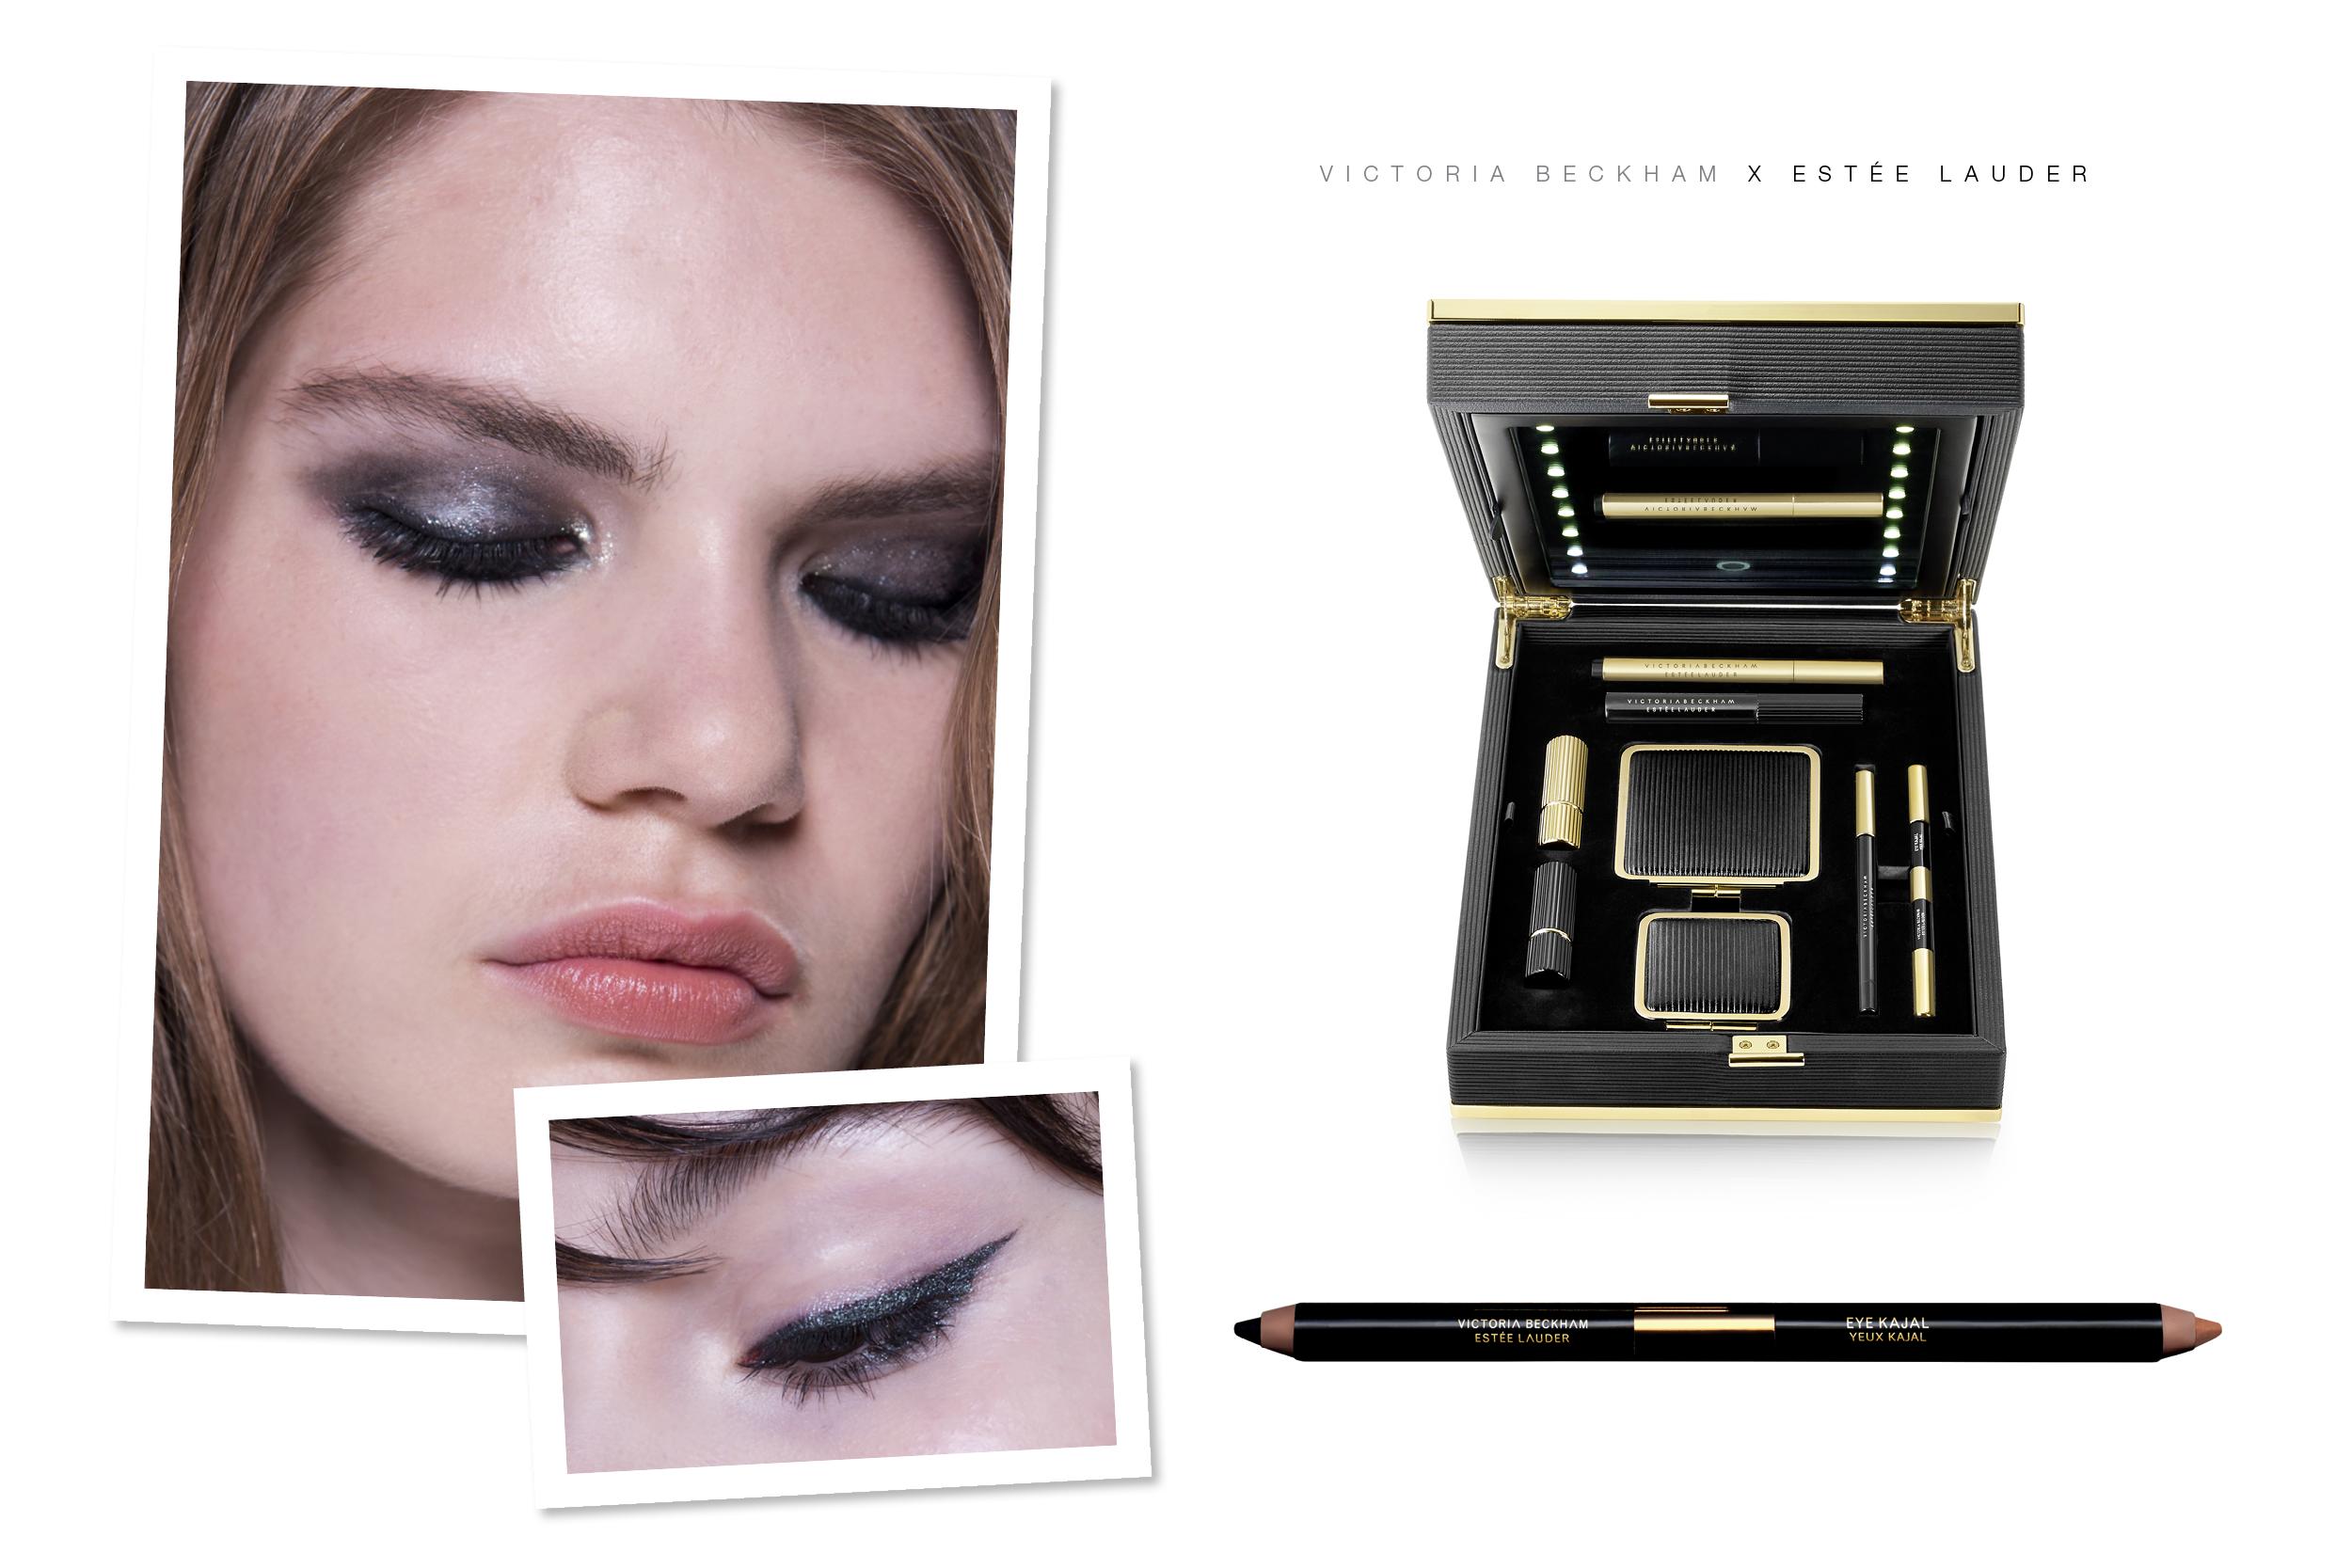 Victoria Beckham Make-up Estée Lauder / Foxycheeks